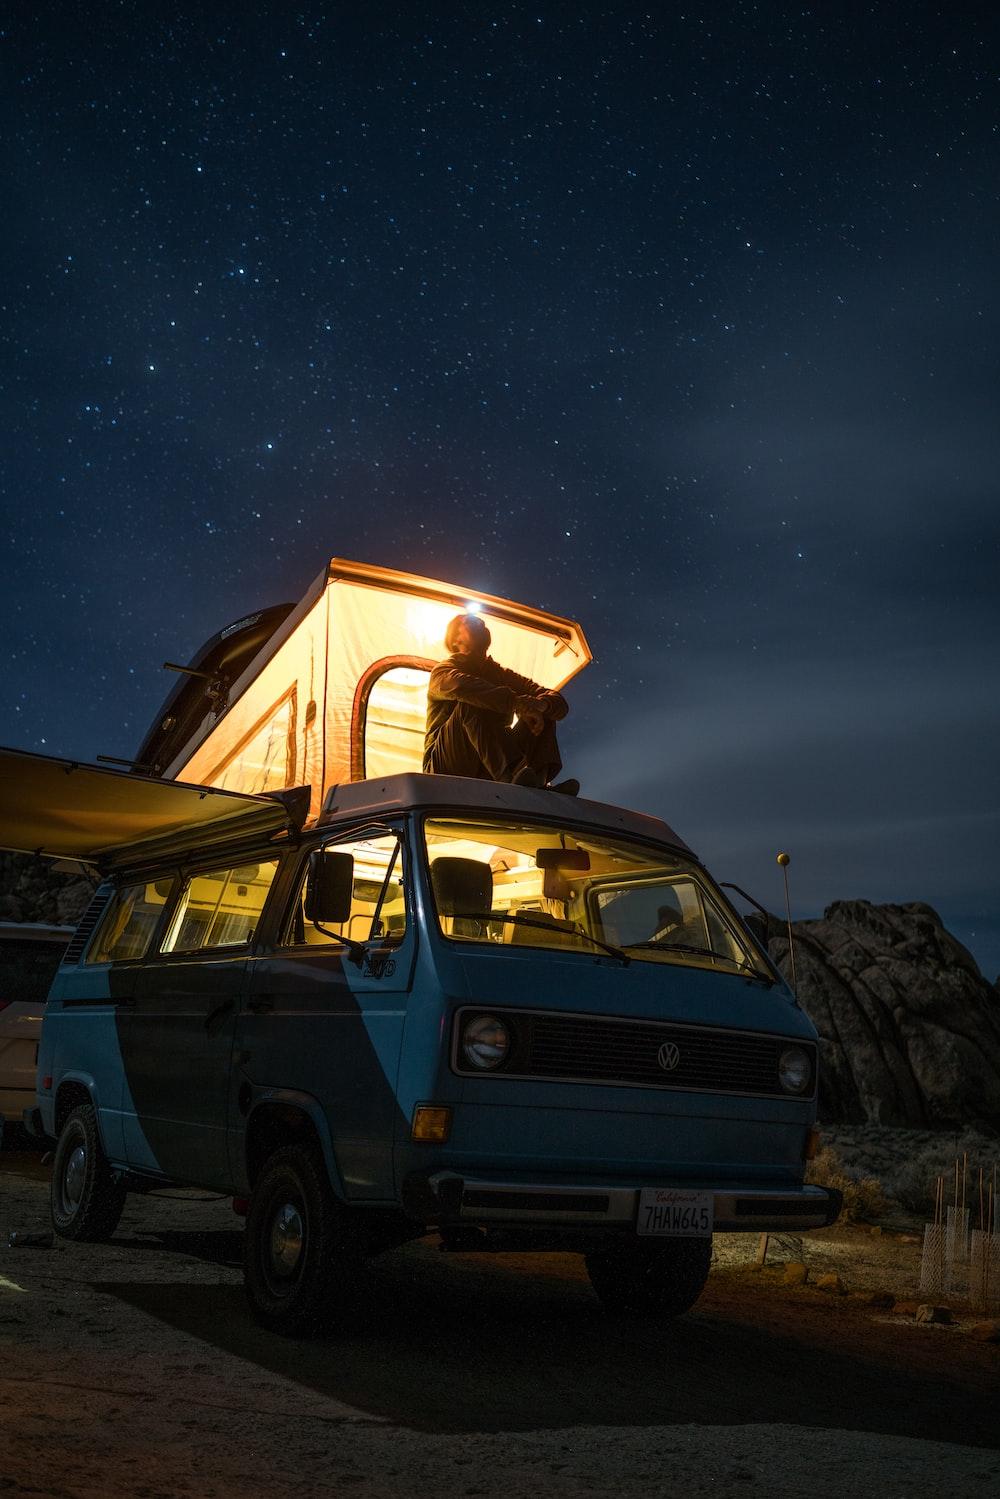 man sitting on top of blue van staring at sky during nighttime